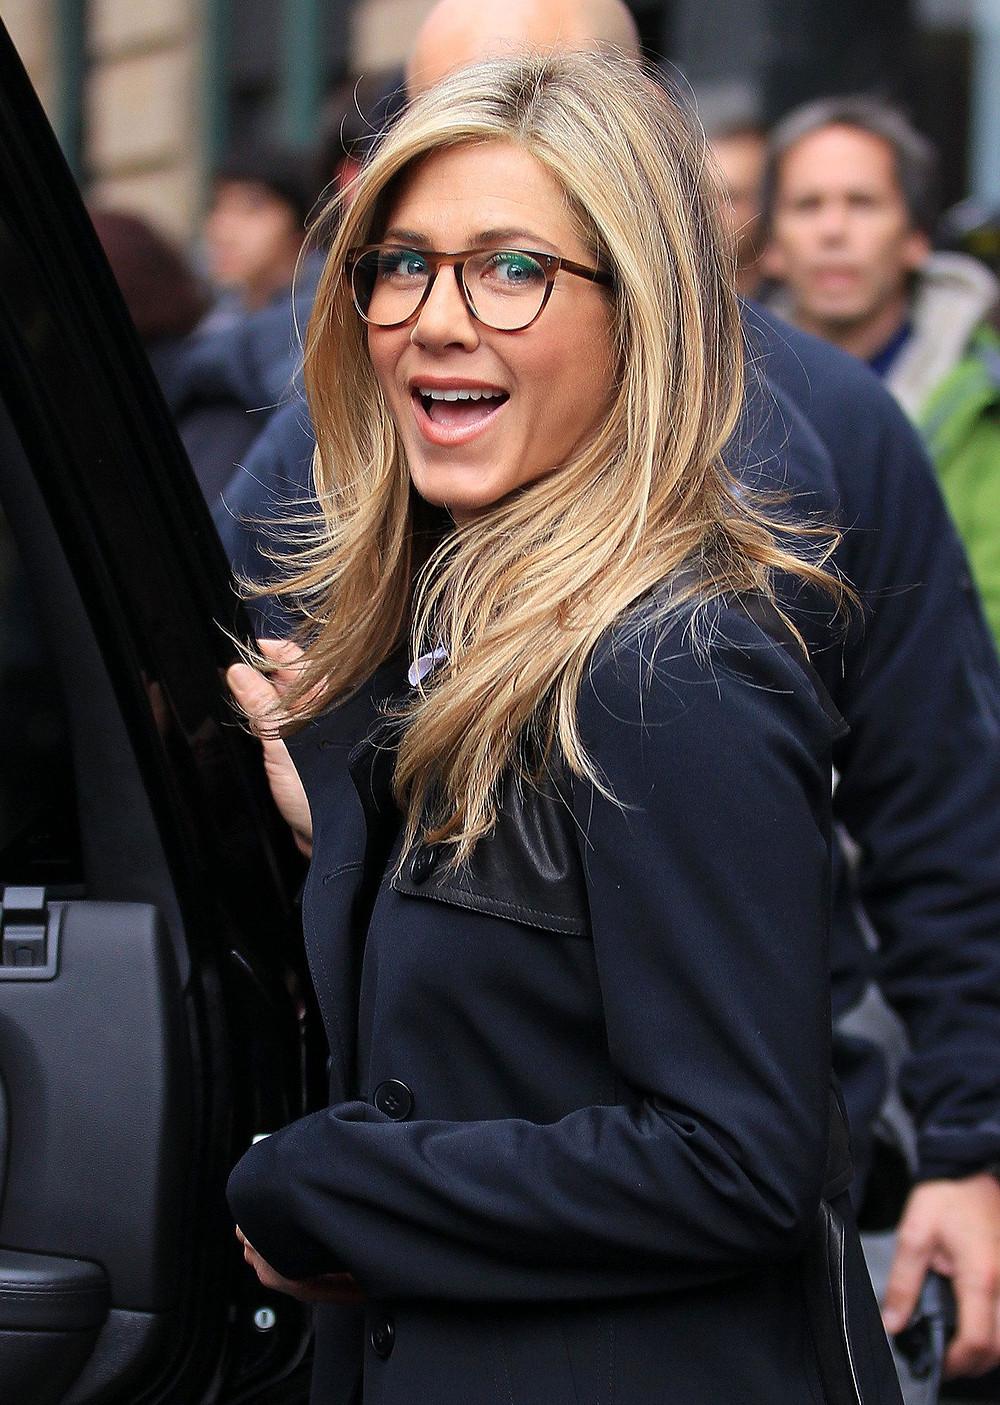 Jennifer Aniston in Glasses